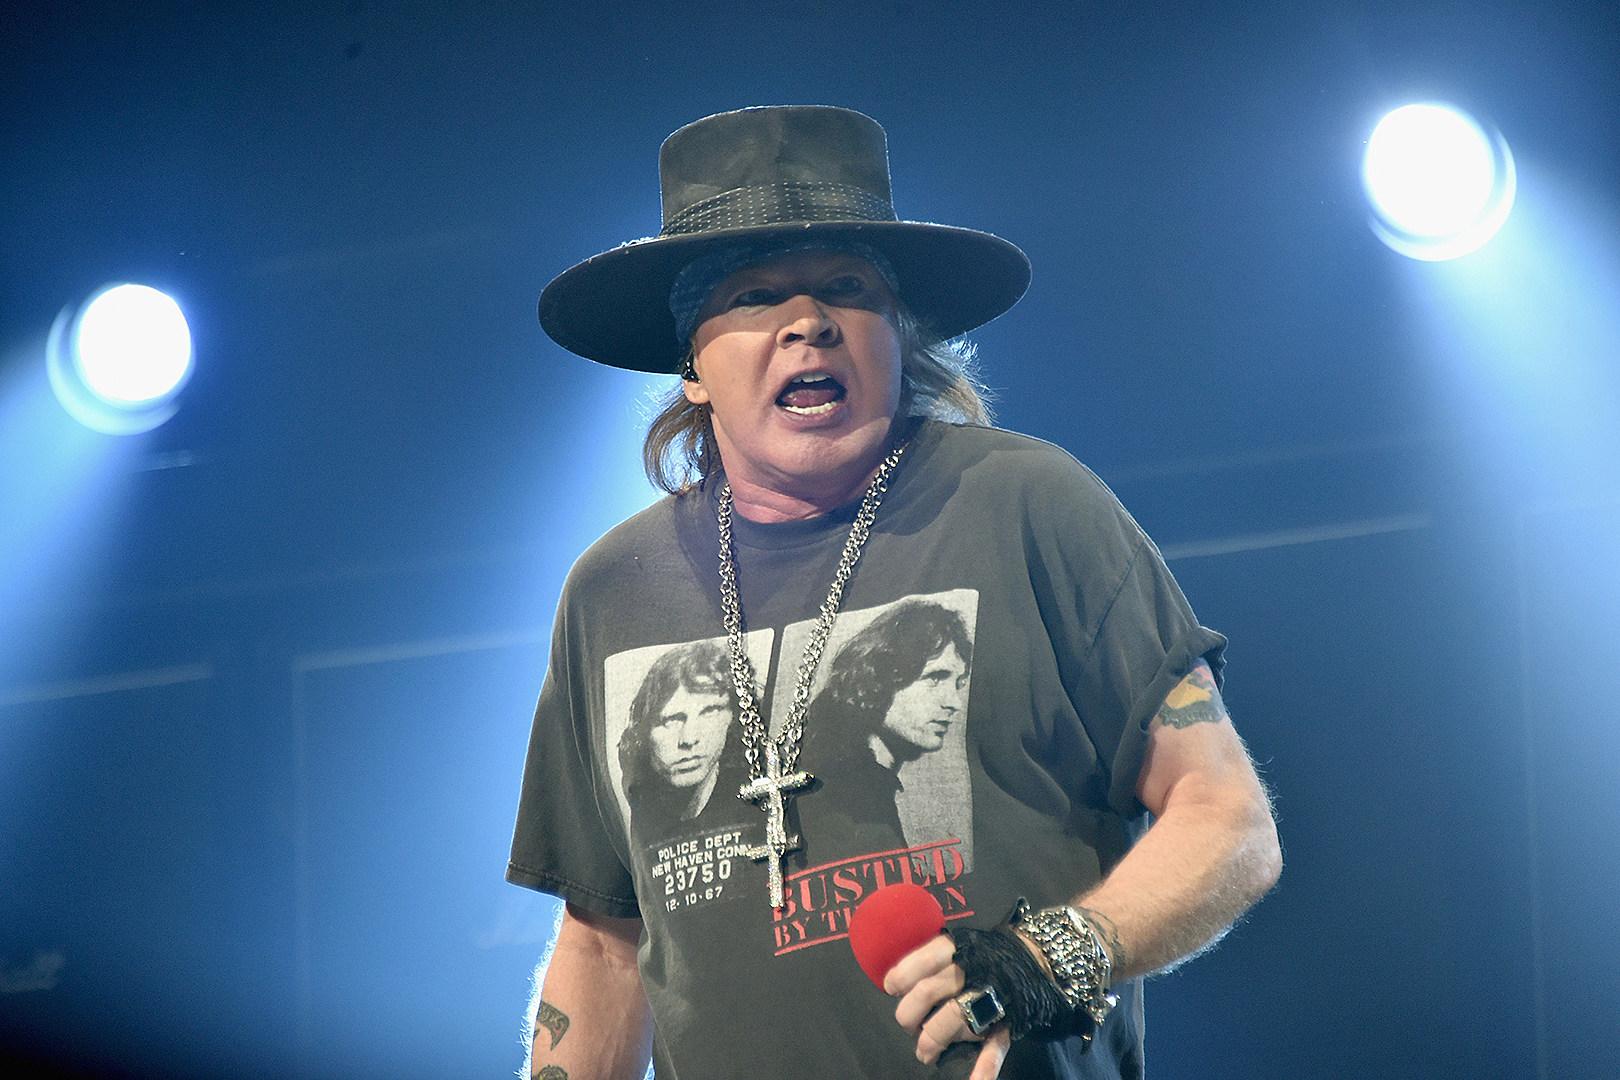 Official Guns N Roses Welcome To The Jungle T-Shirt November Rain Estranged